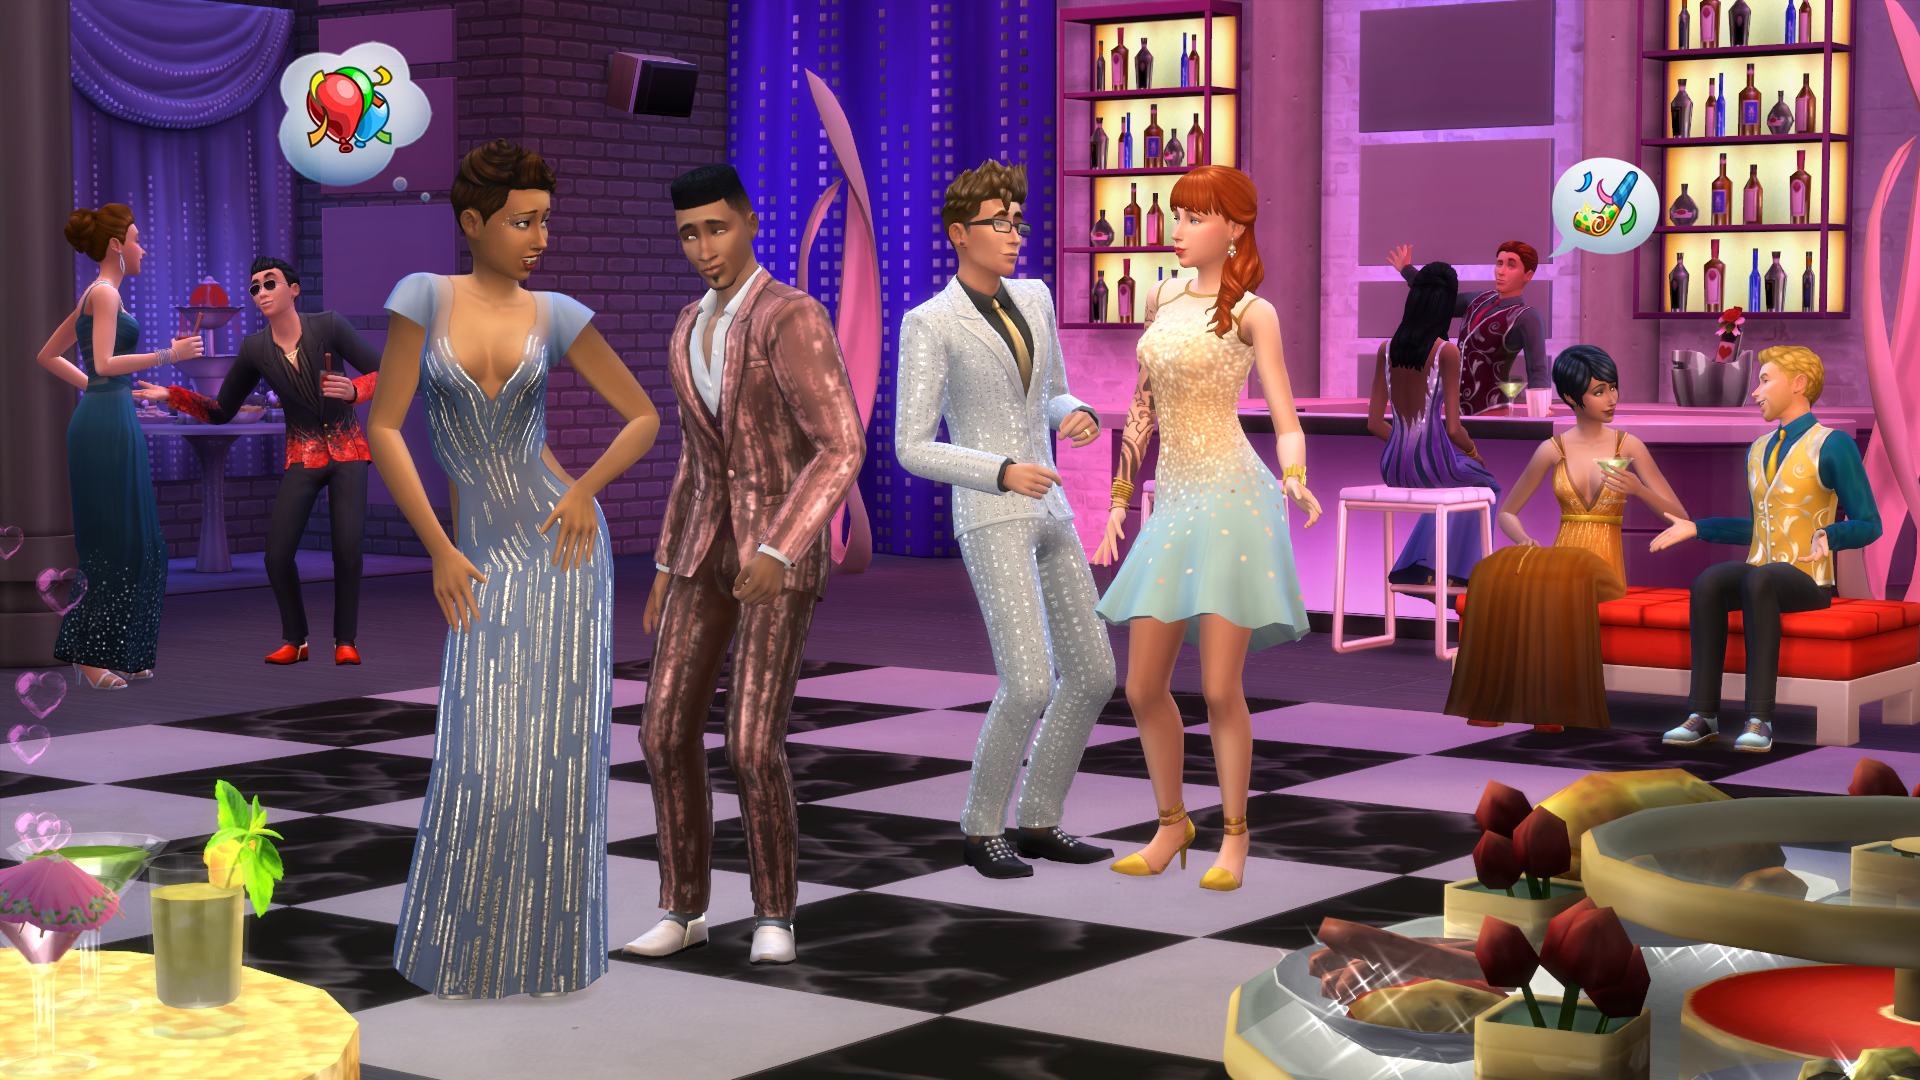 Sex parties in sims arkansas erotic photos